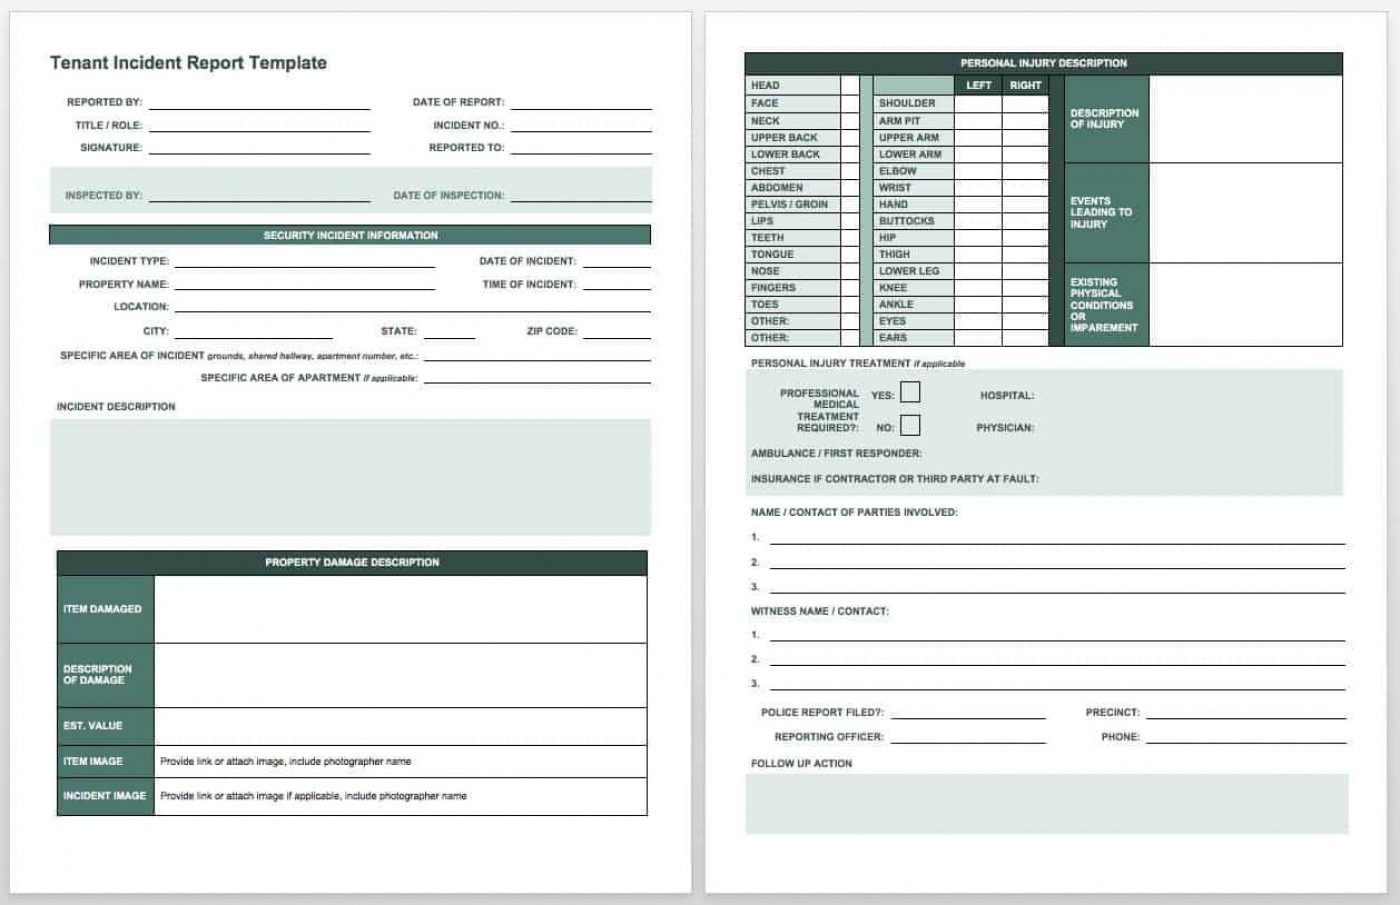 007 Surprising Workplace Injury Report Form Template Ontario Example 1400